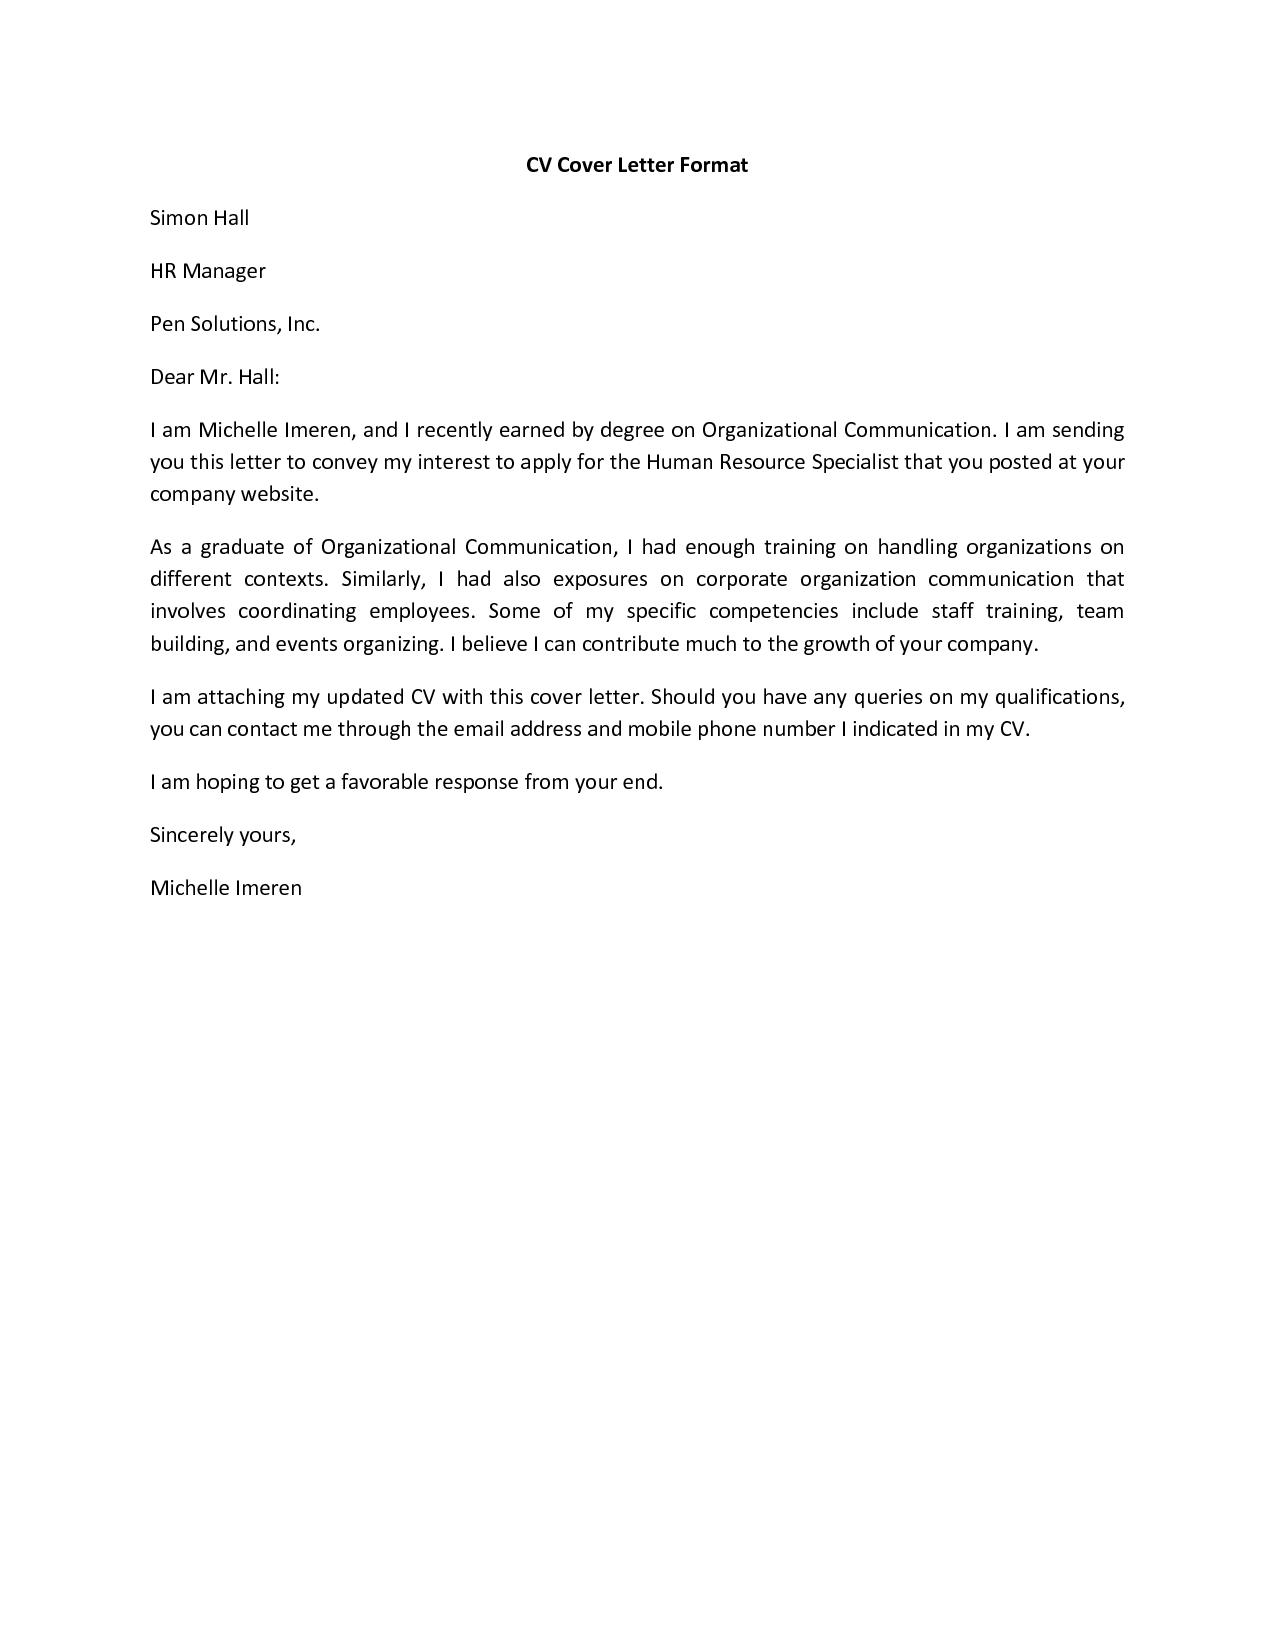 Basic Cover Letter For Resume from lh4.googleusercontent.com